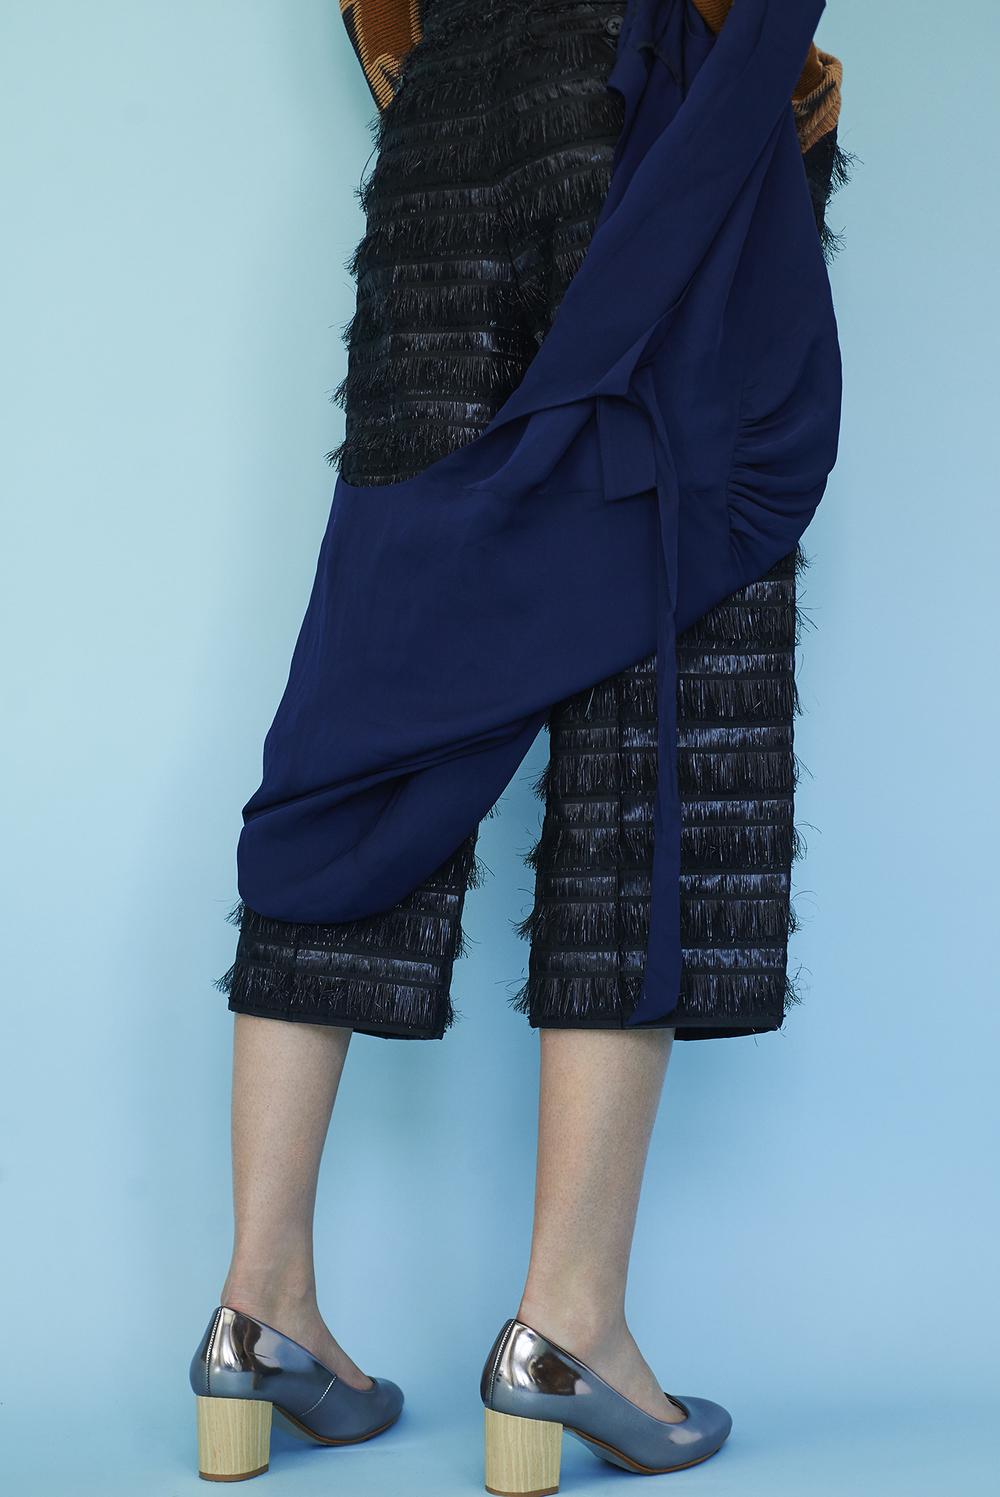 alana-fashion4434 copy.jpg